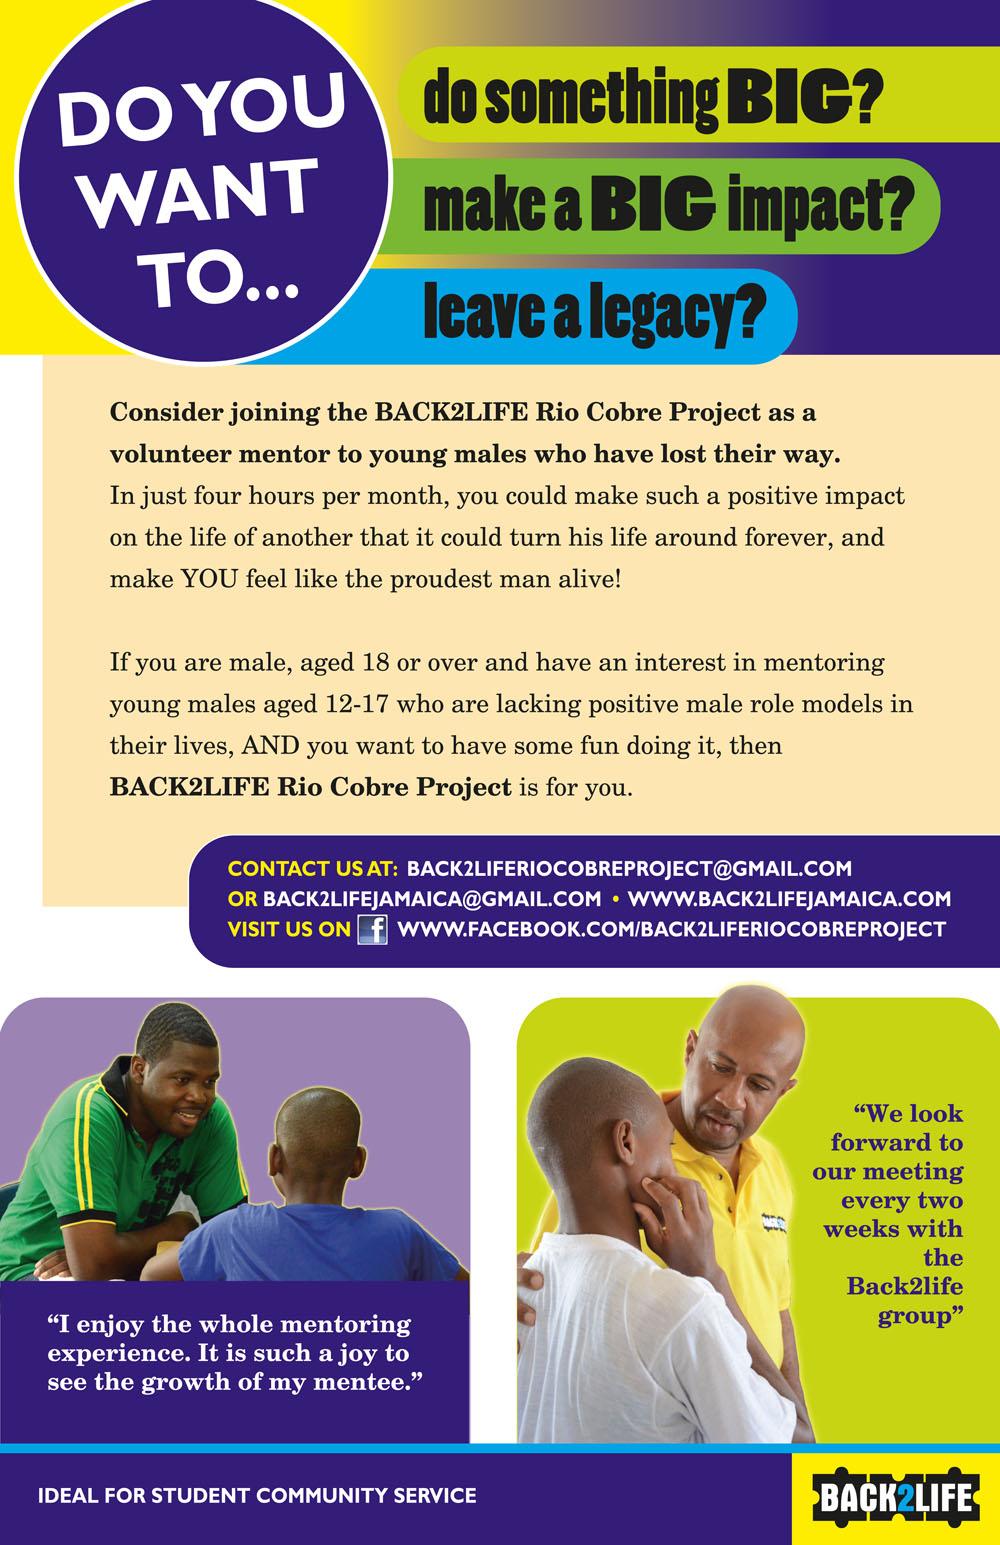 Jamaican mentors